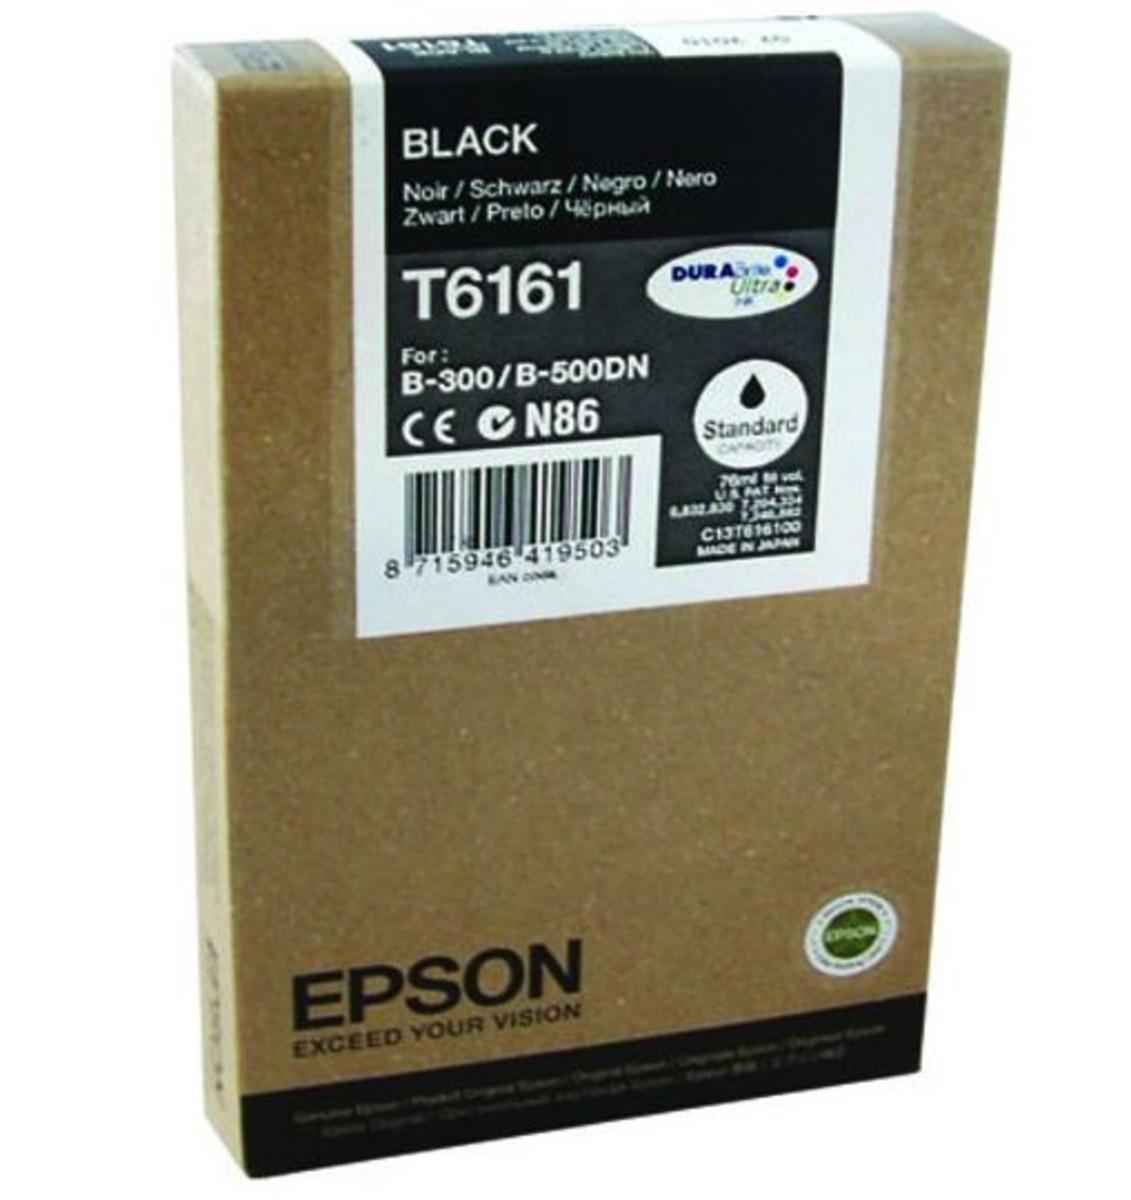 Epson C13T616100 Black Ink Cartridge